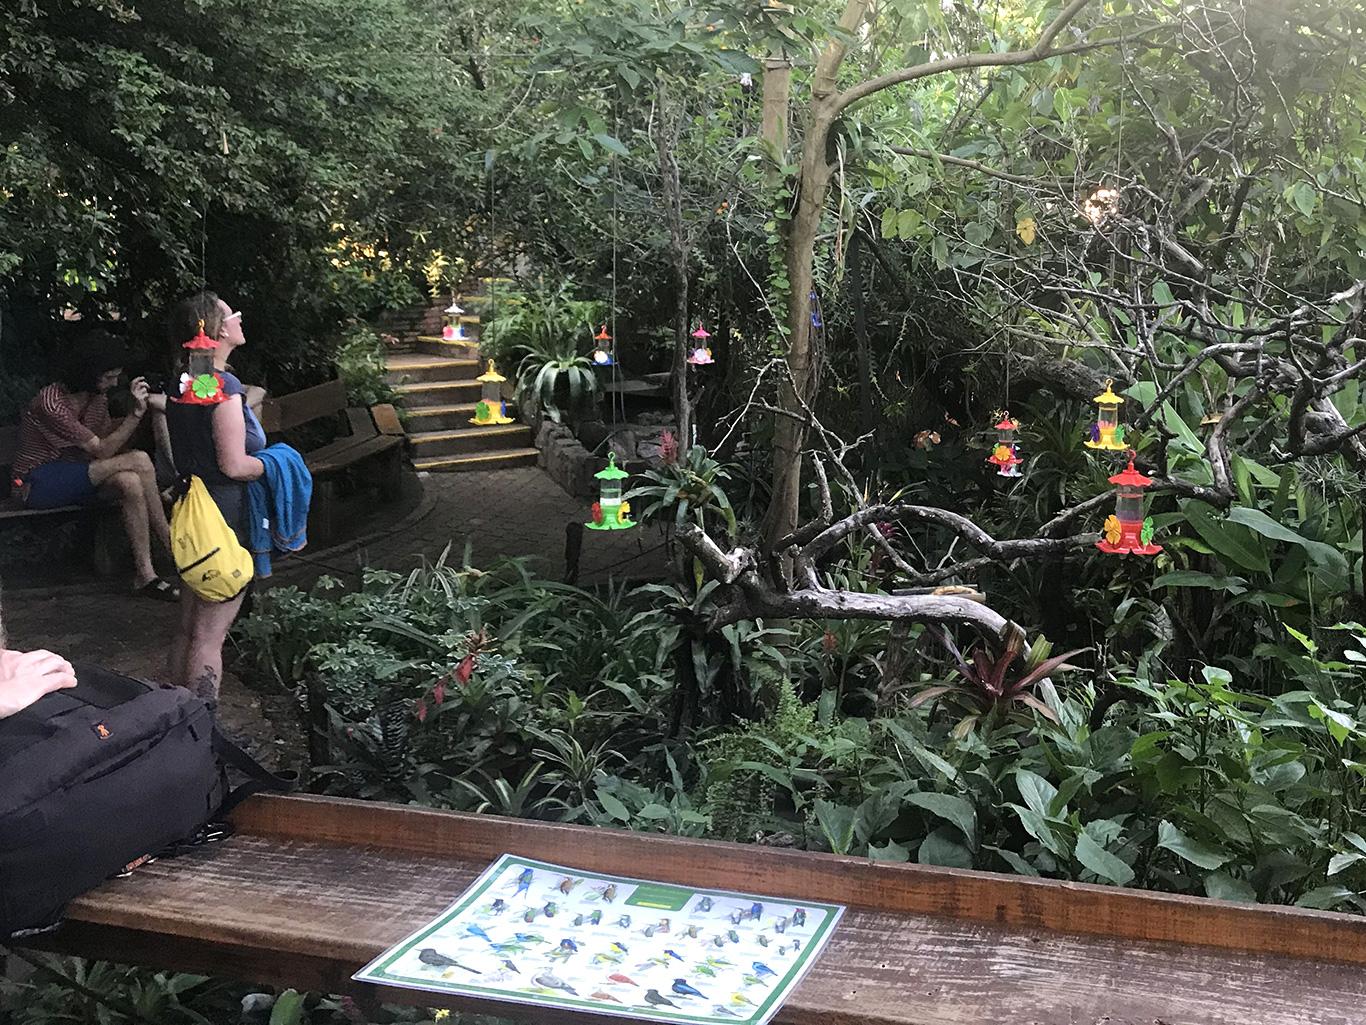 Jardin de Picaflores (Hummingbird Garden), Puerto Iguazú, Argentina.